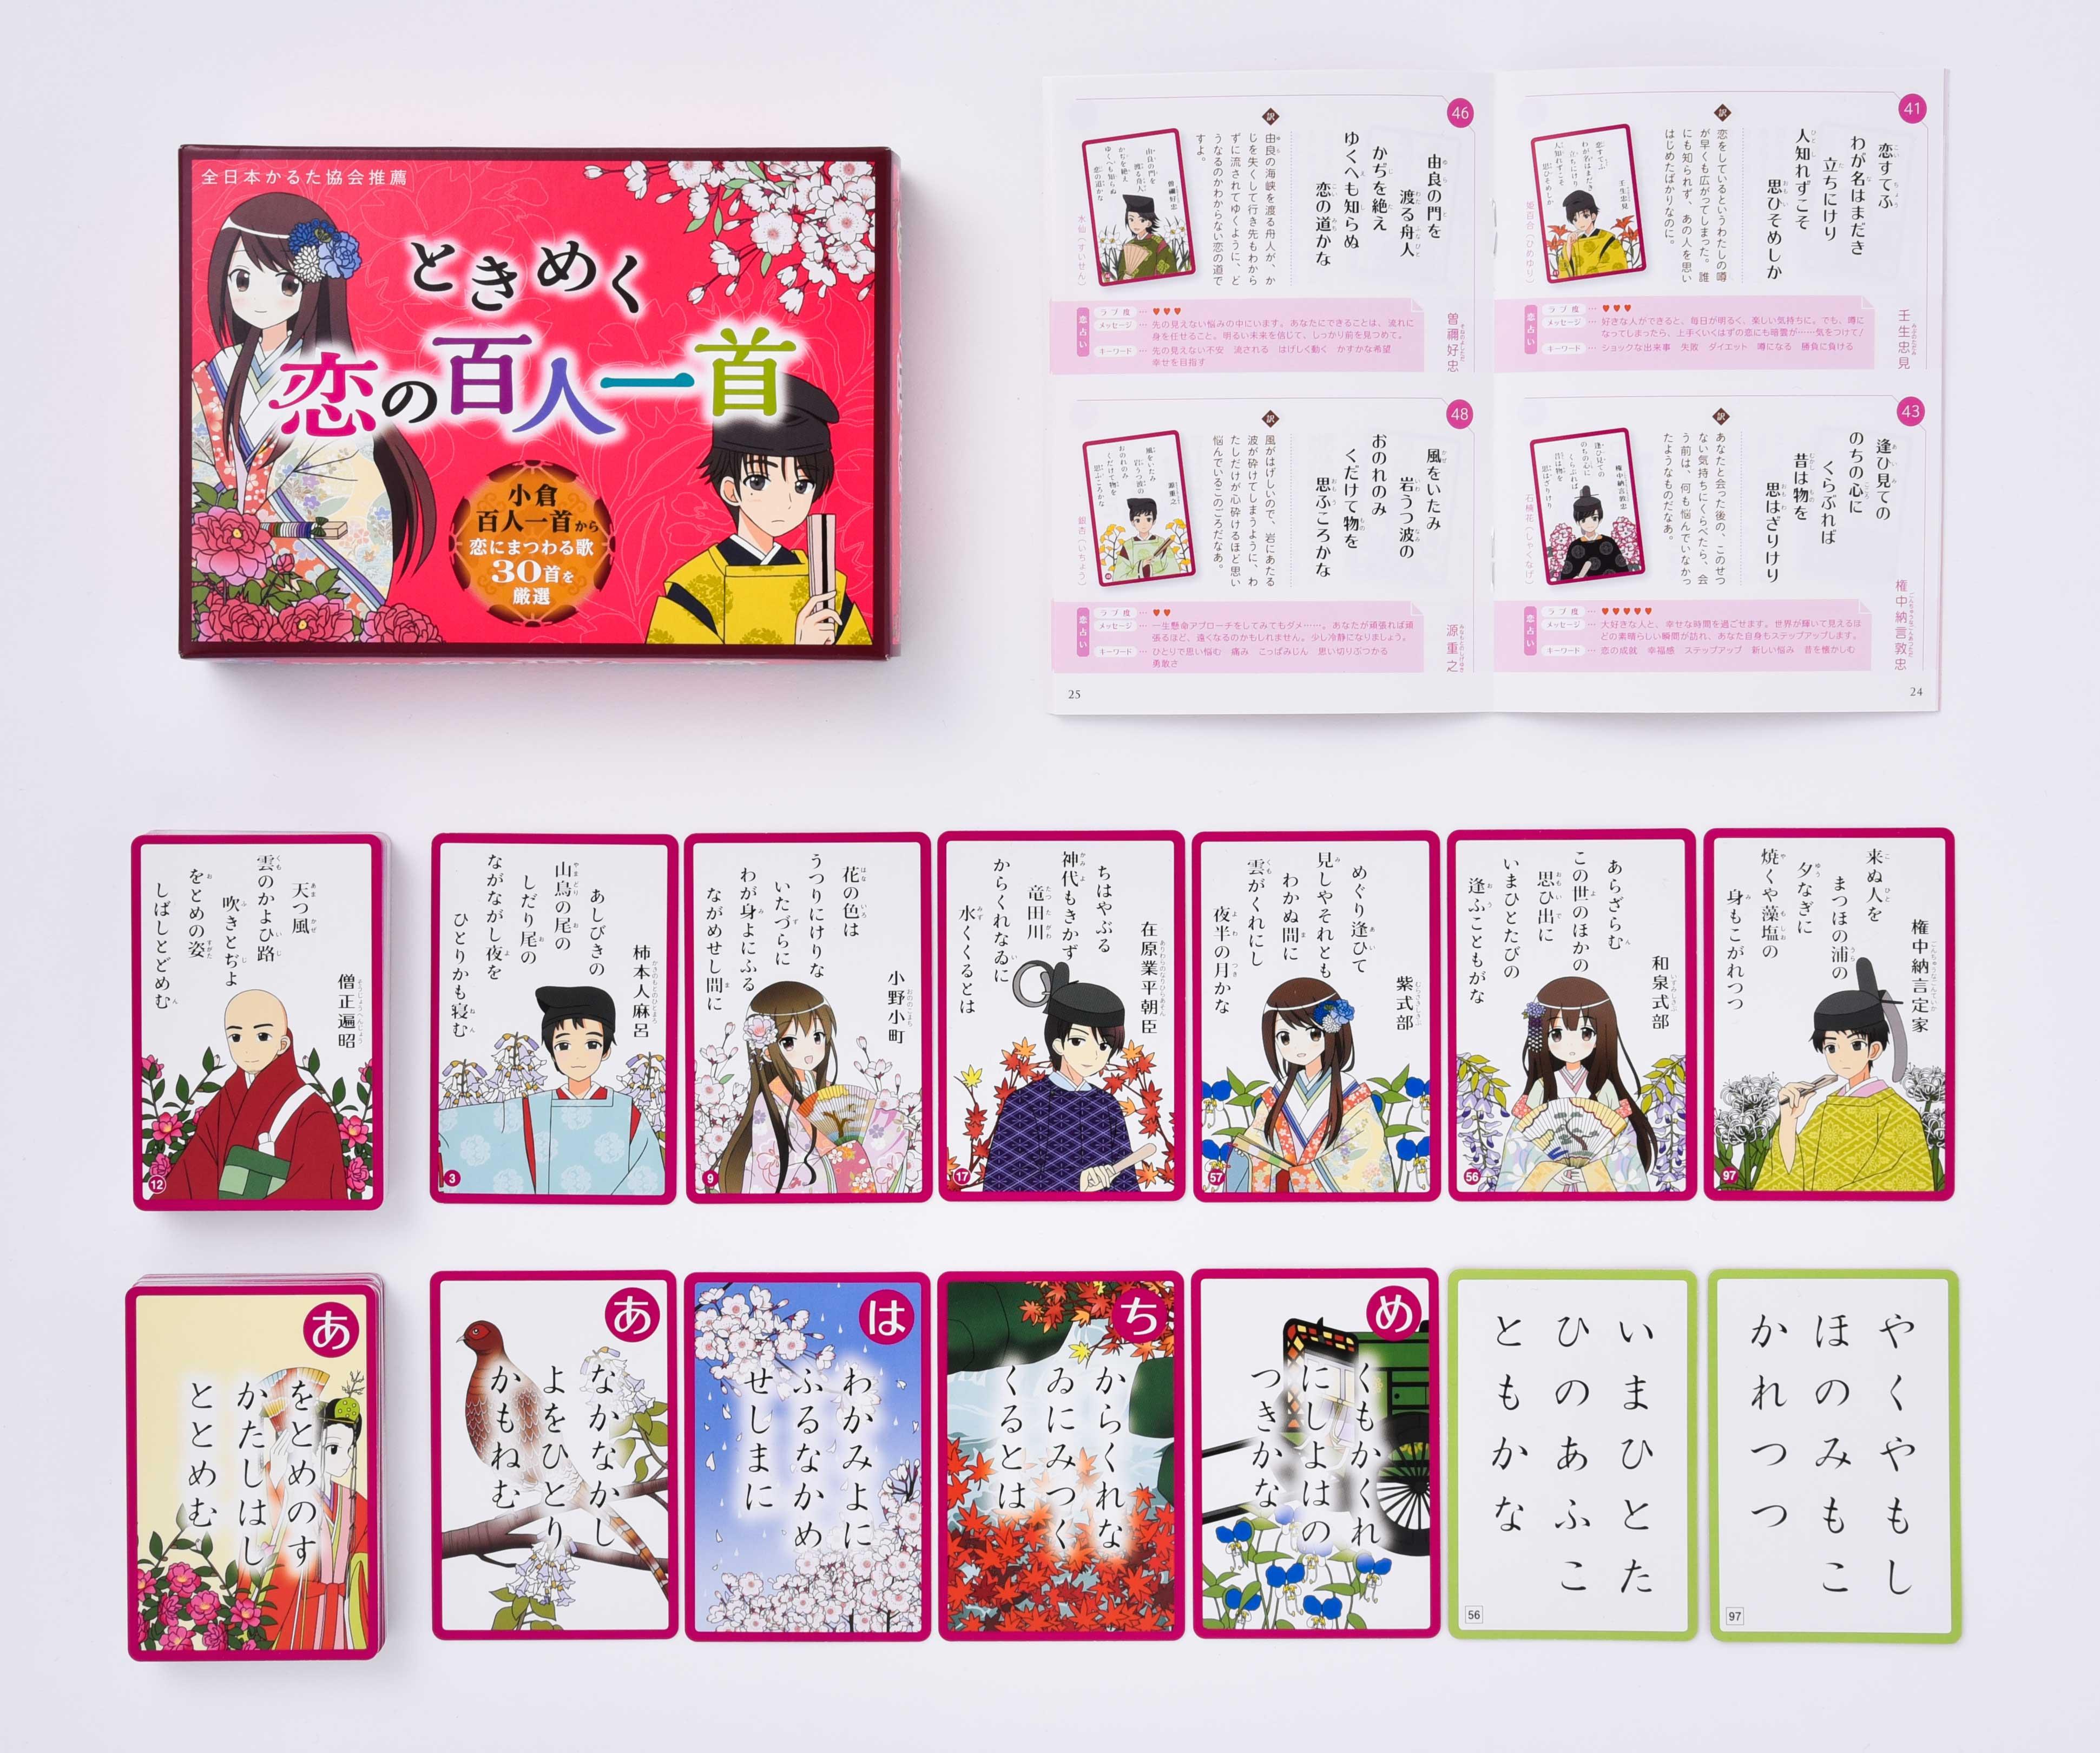 https://www.gentosha-edu.co.jp/files/tokimekukoi.jpg